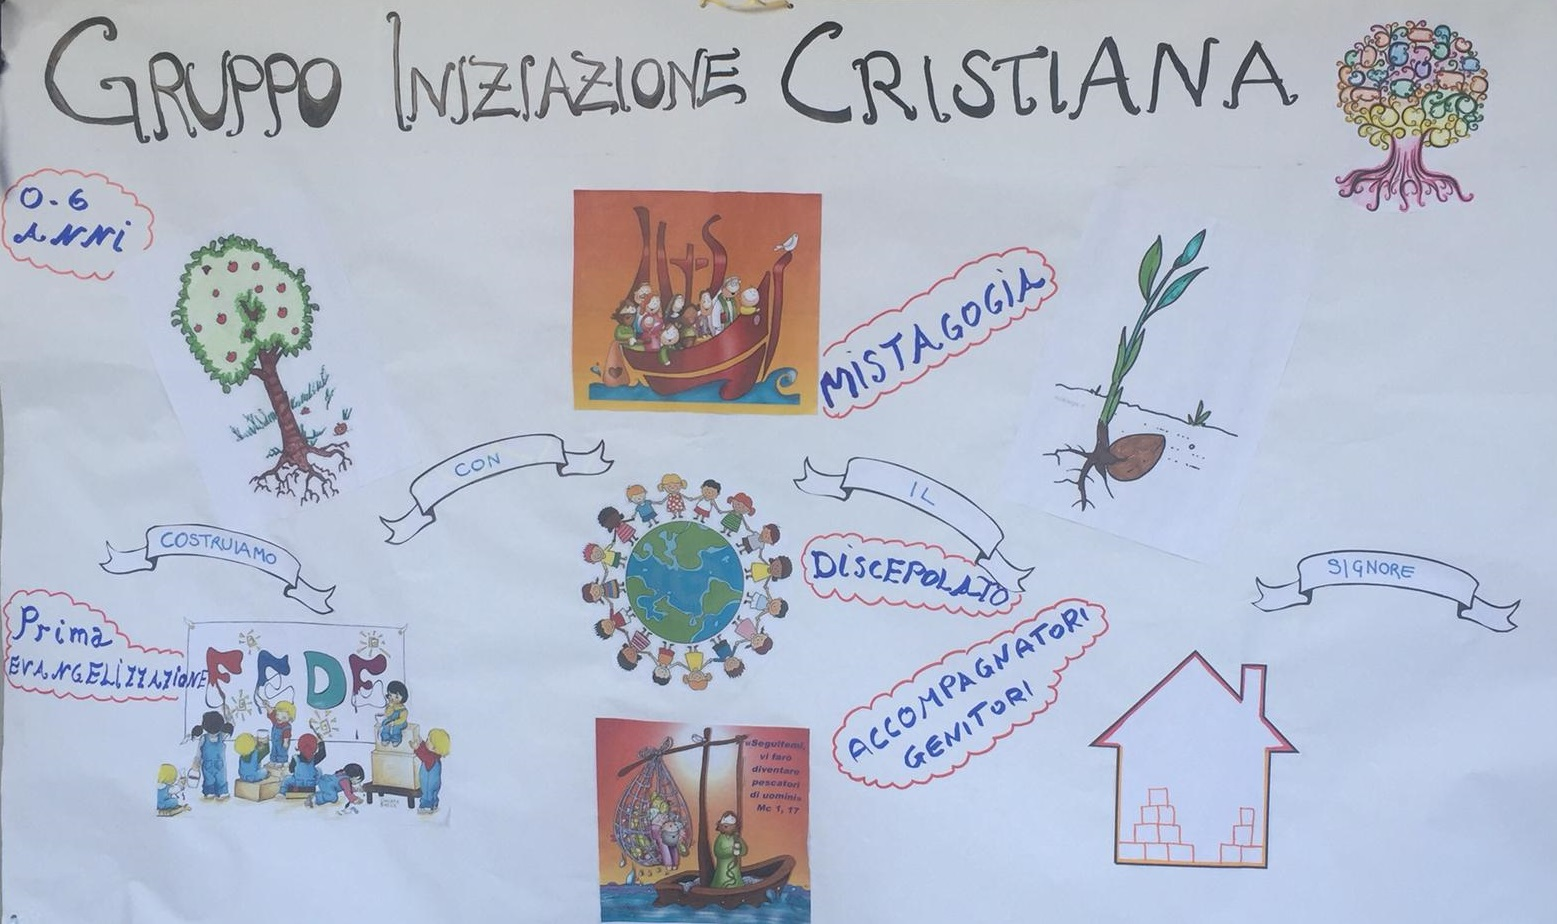 GruppoIniziazioneCristiana